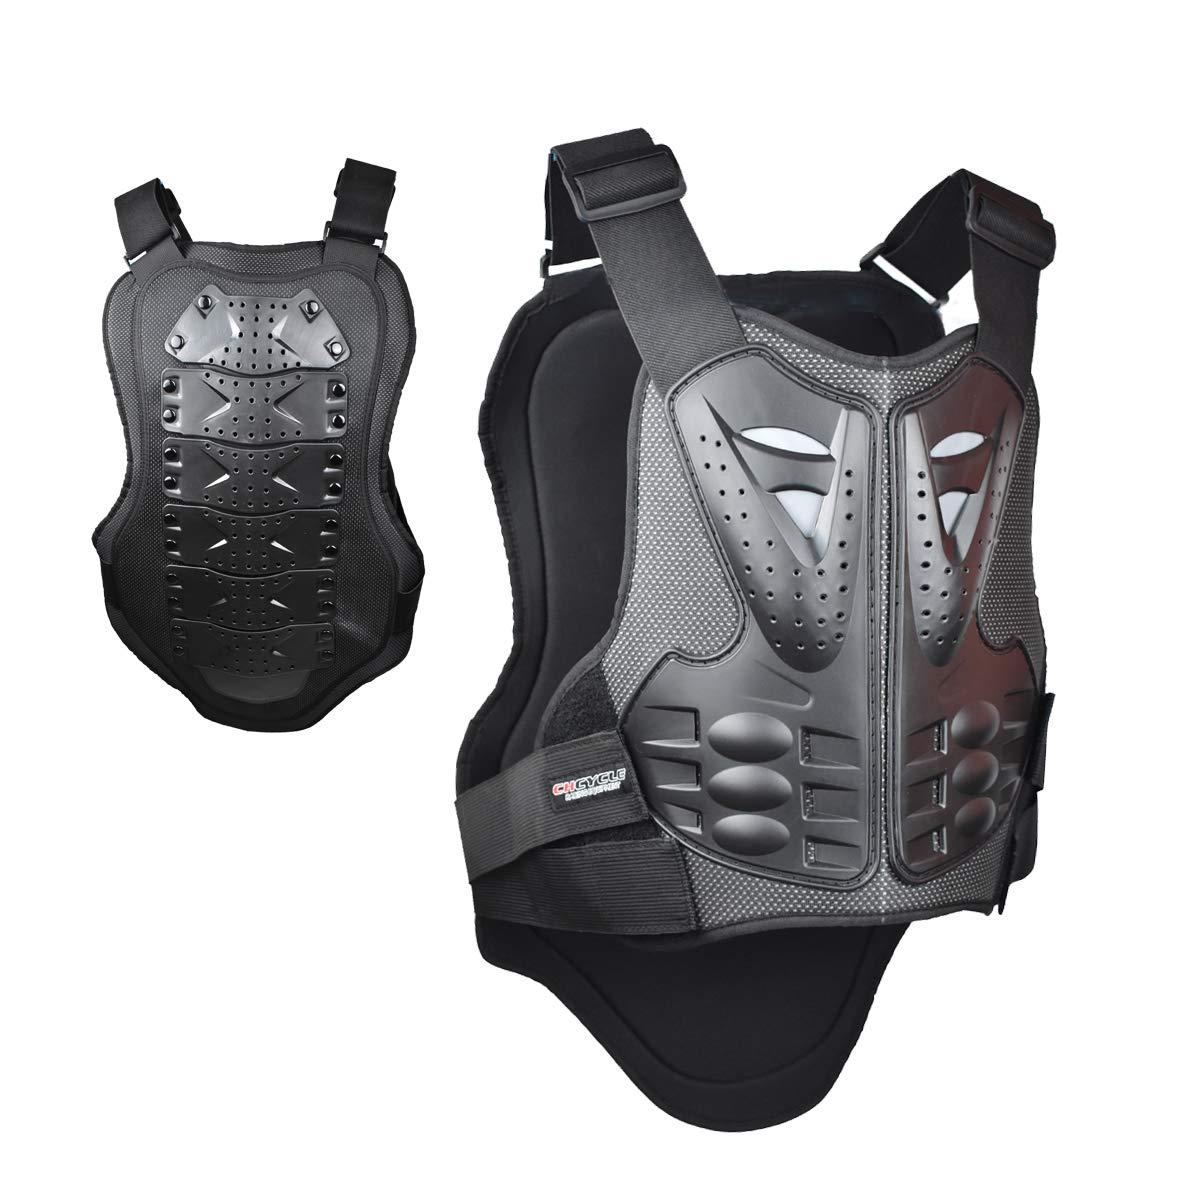 CHCYCLE motorcycle vest armor pretection (medium)